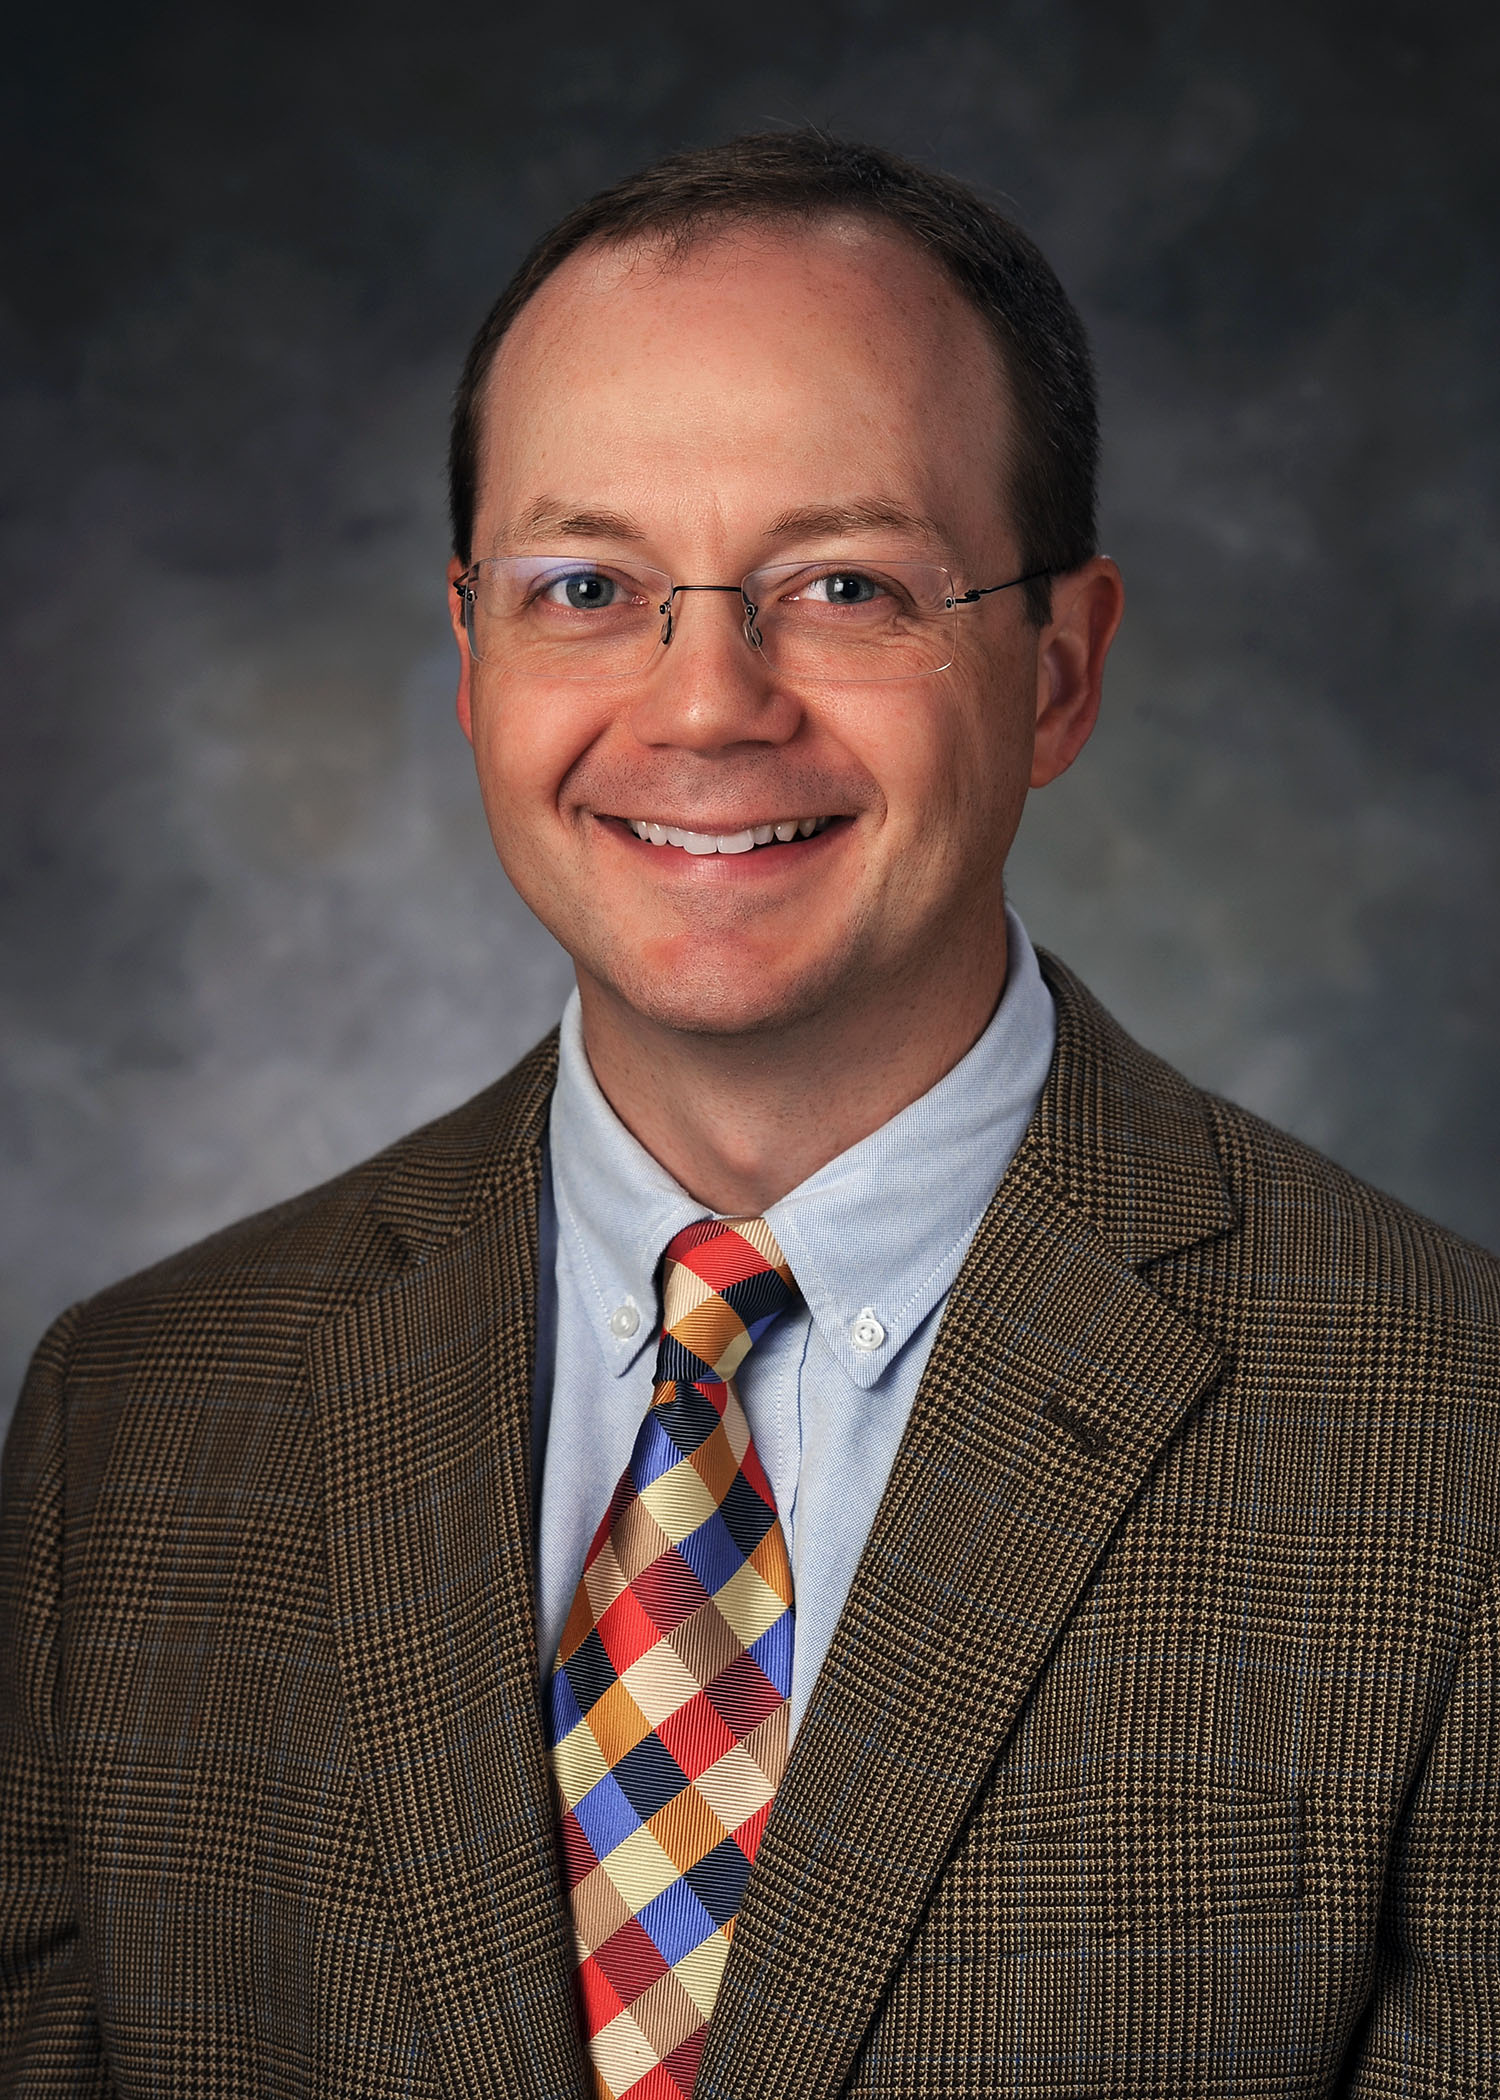 Ernest M. Quin, MD